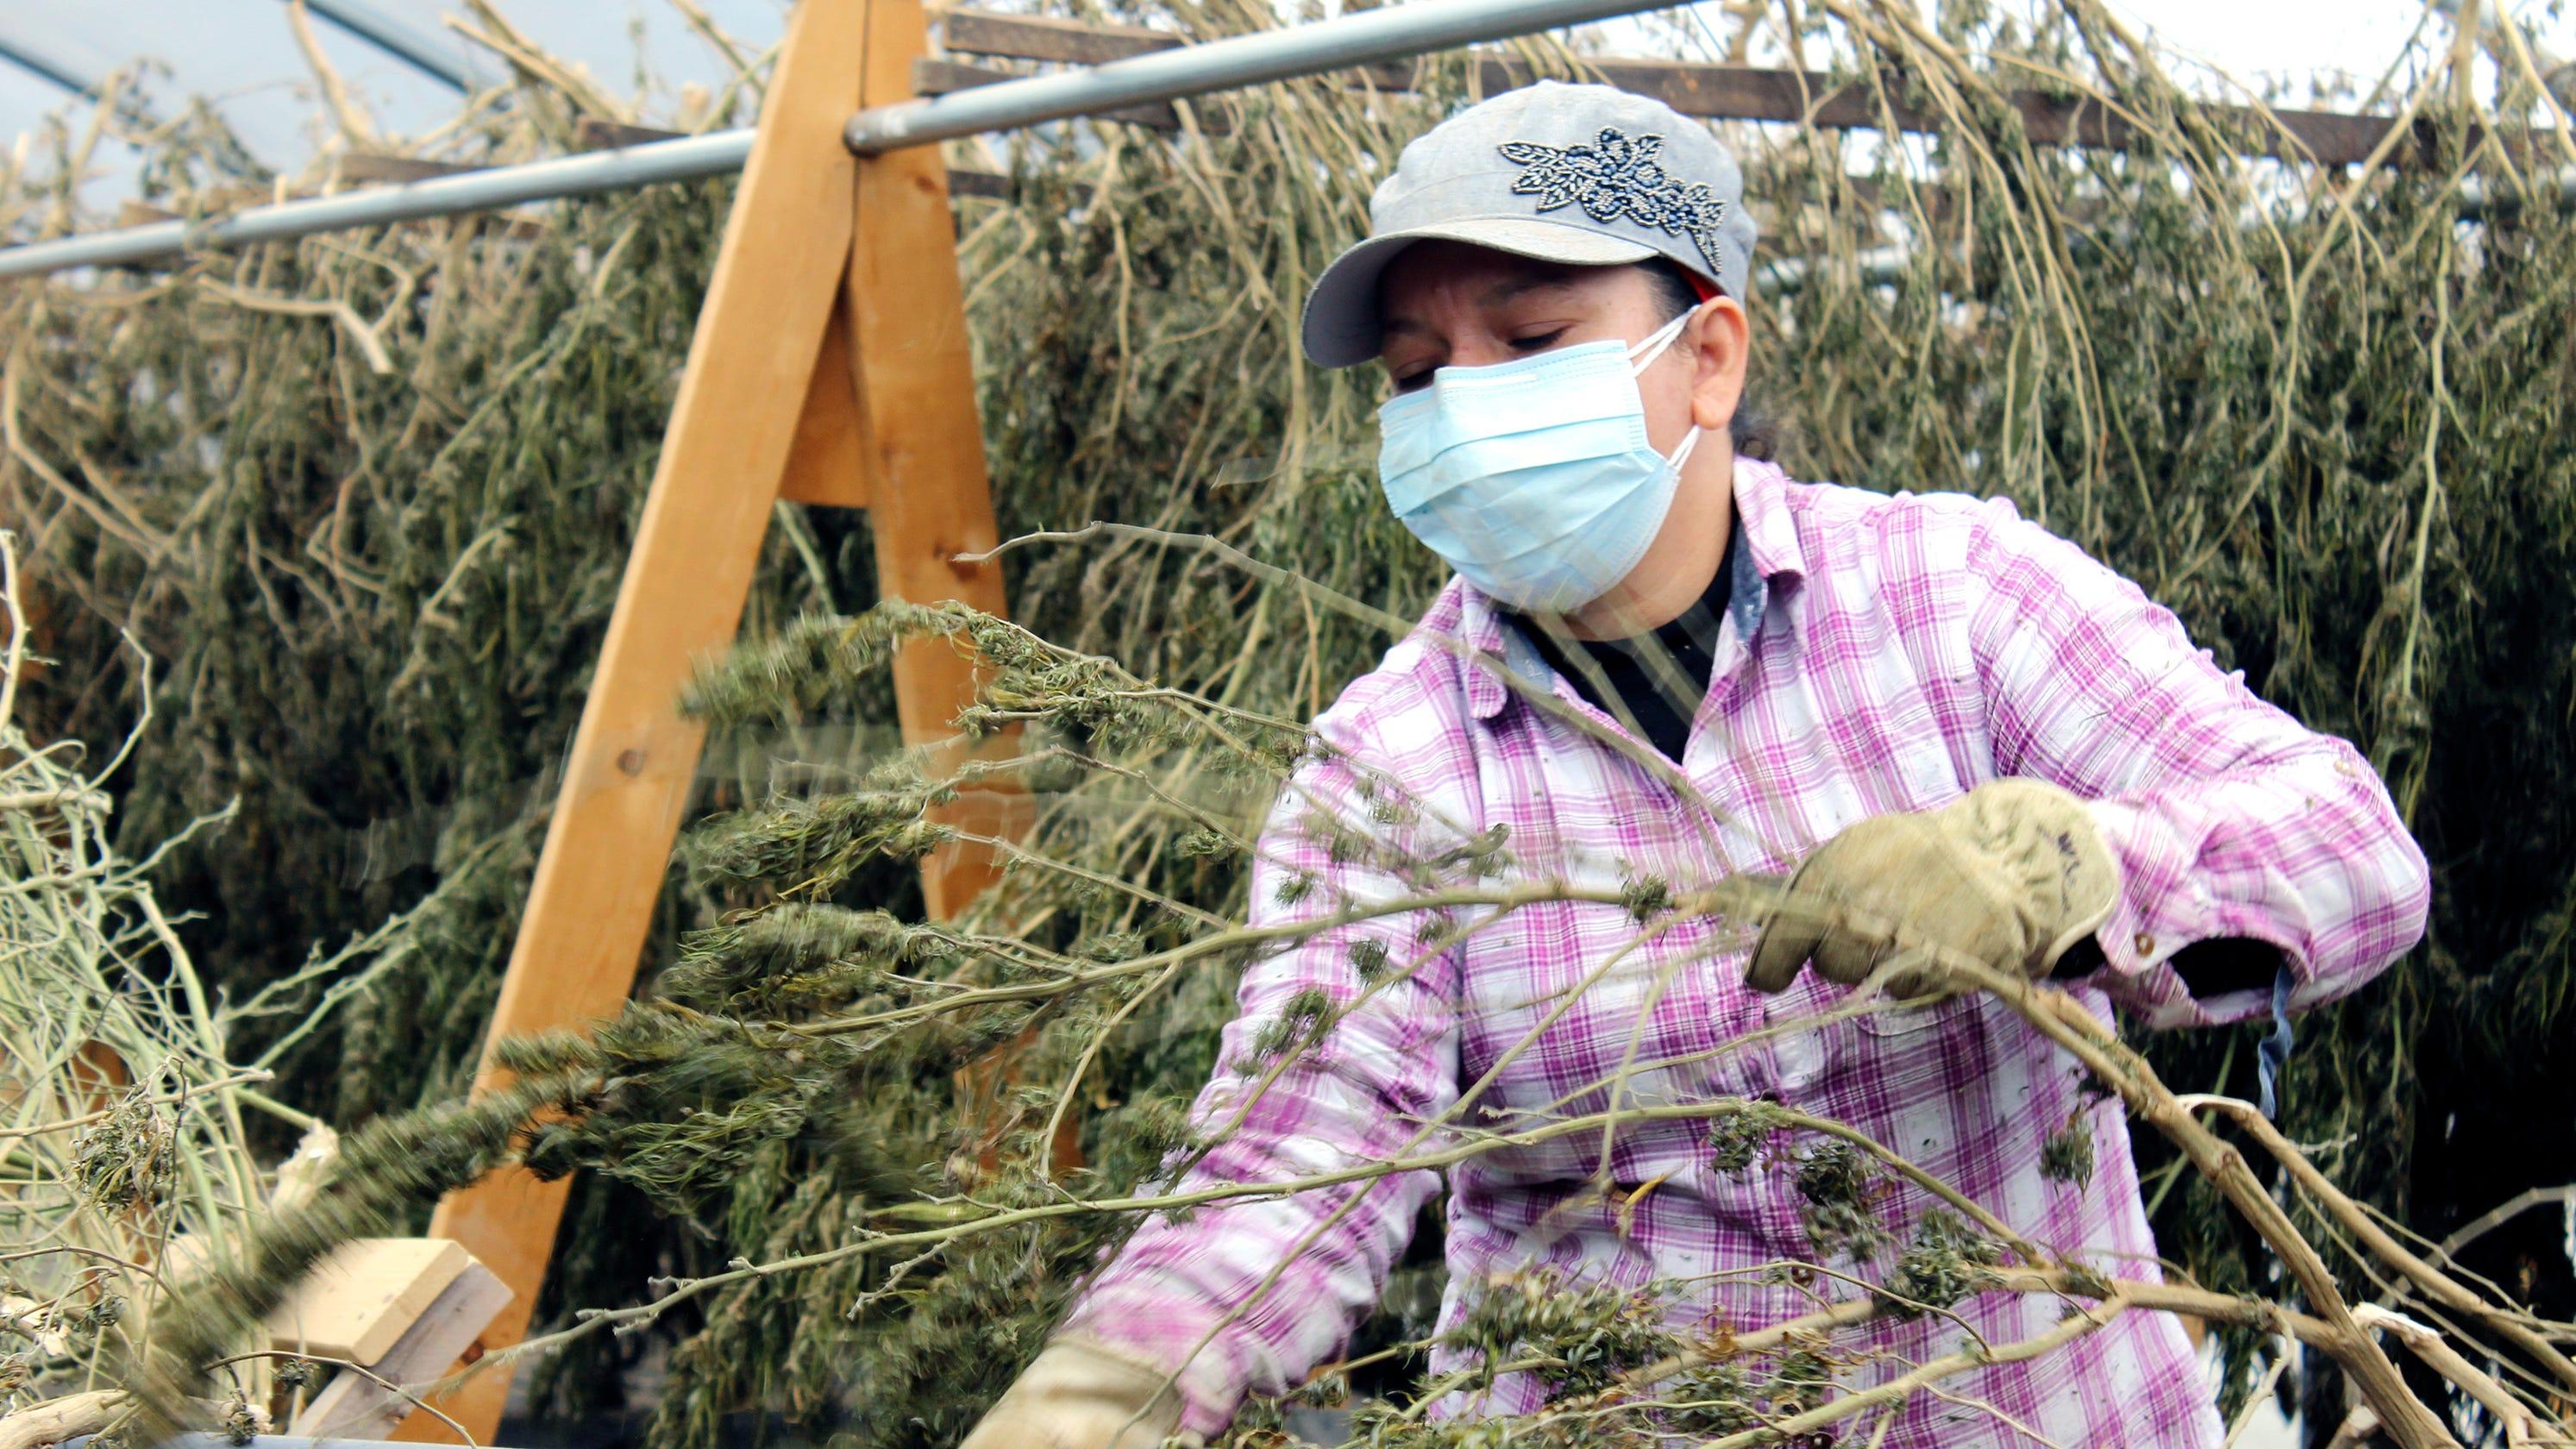 Trump legalizes hemp and CBD with Farm Bill, aiding Tennessee farmers